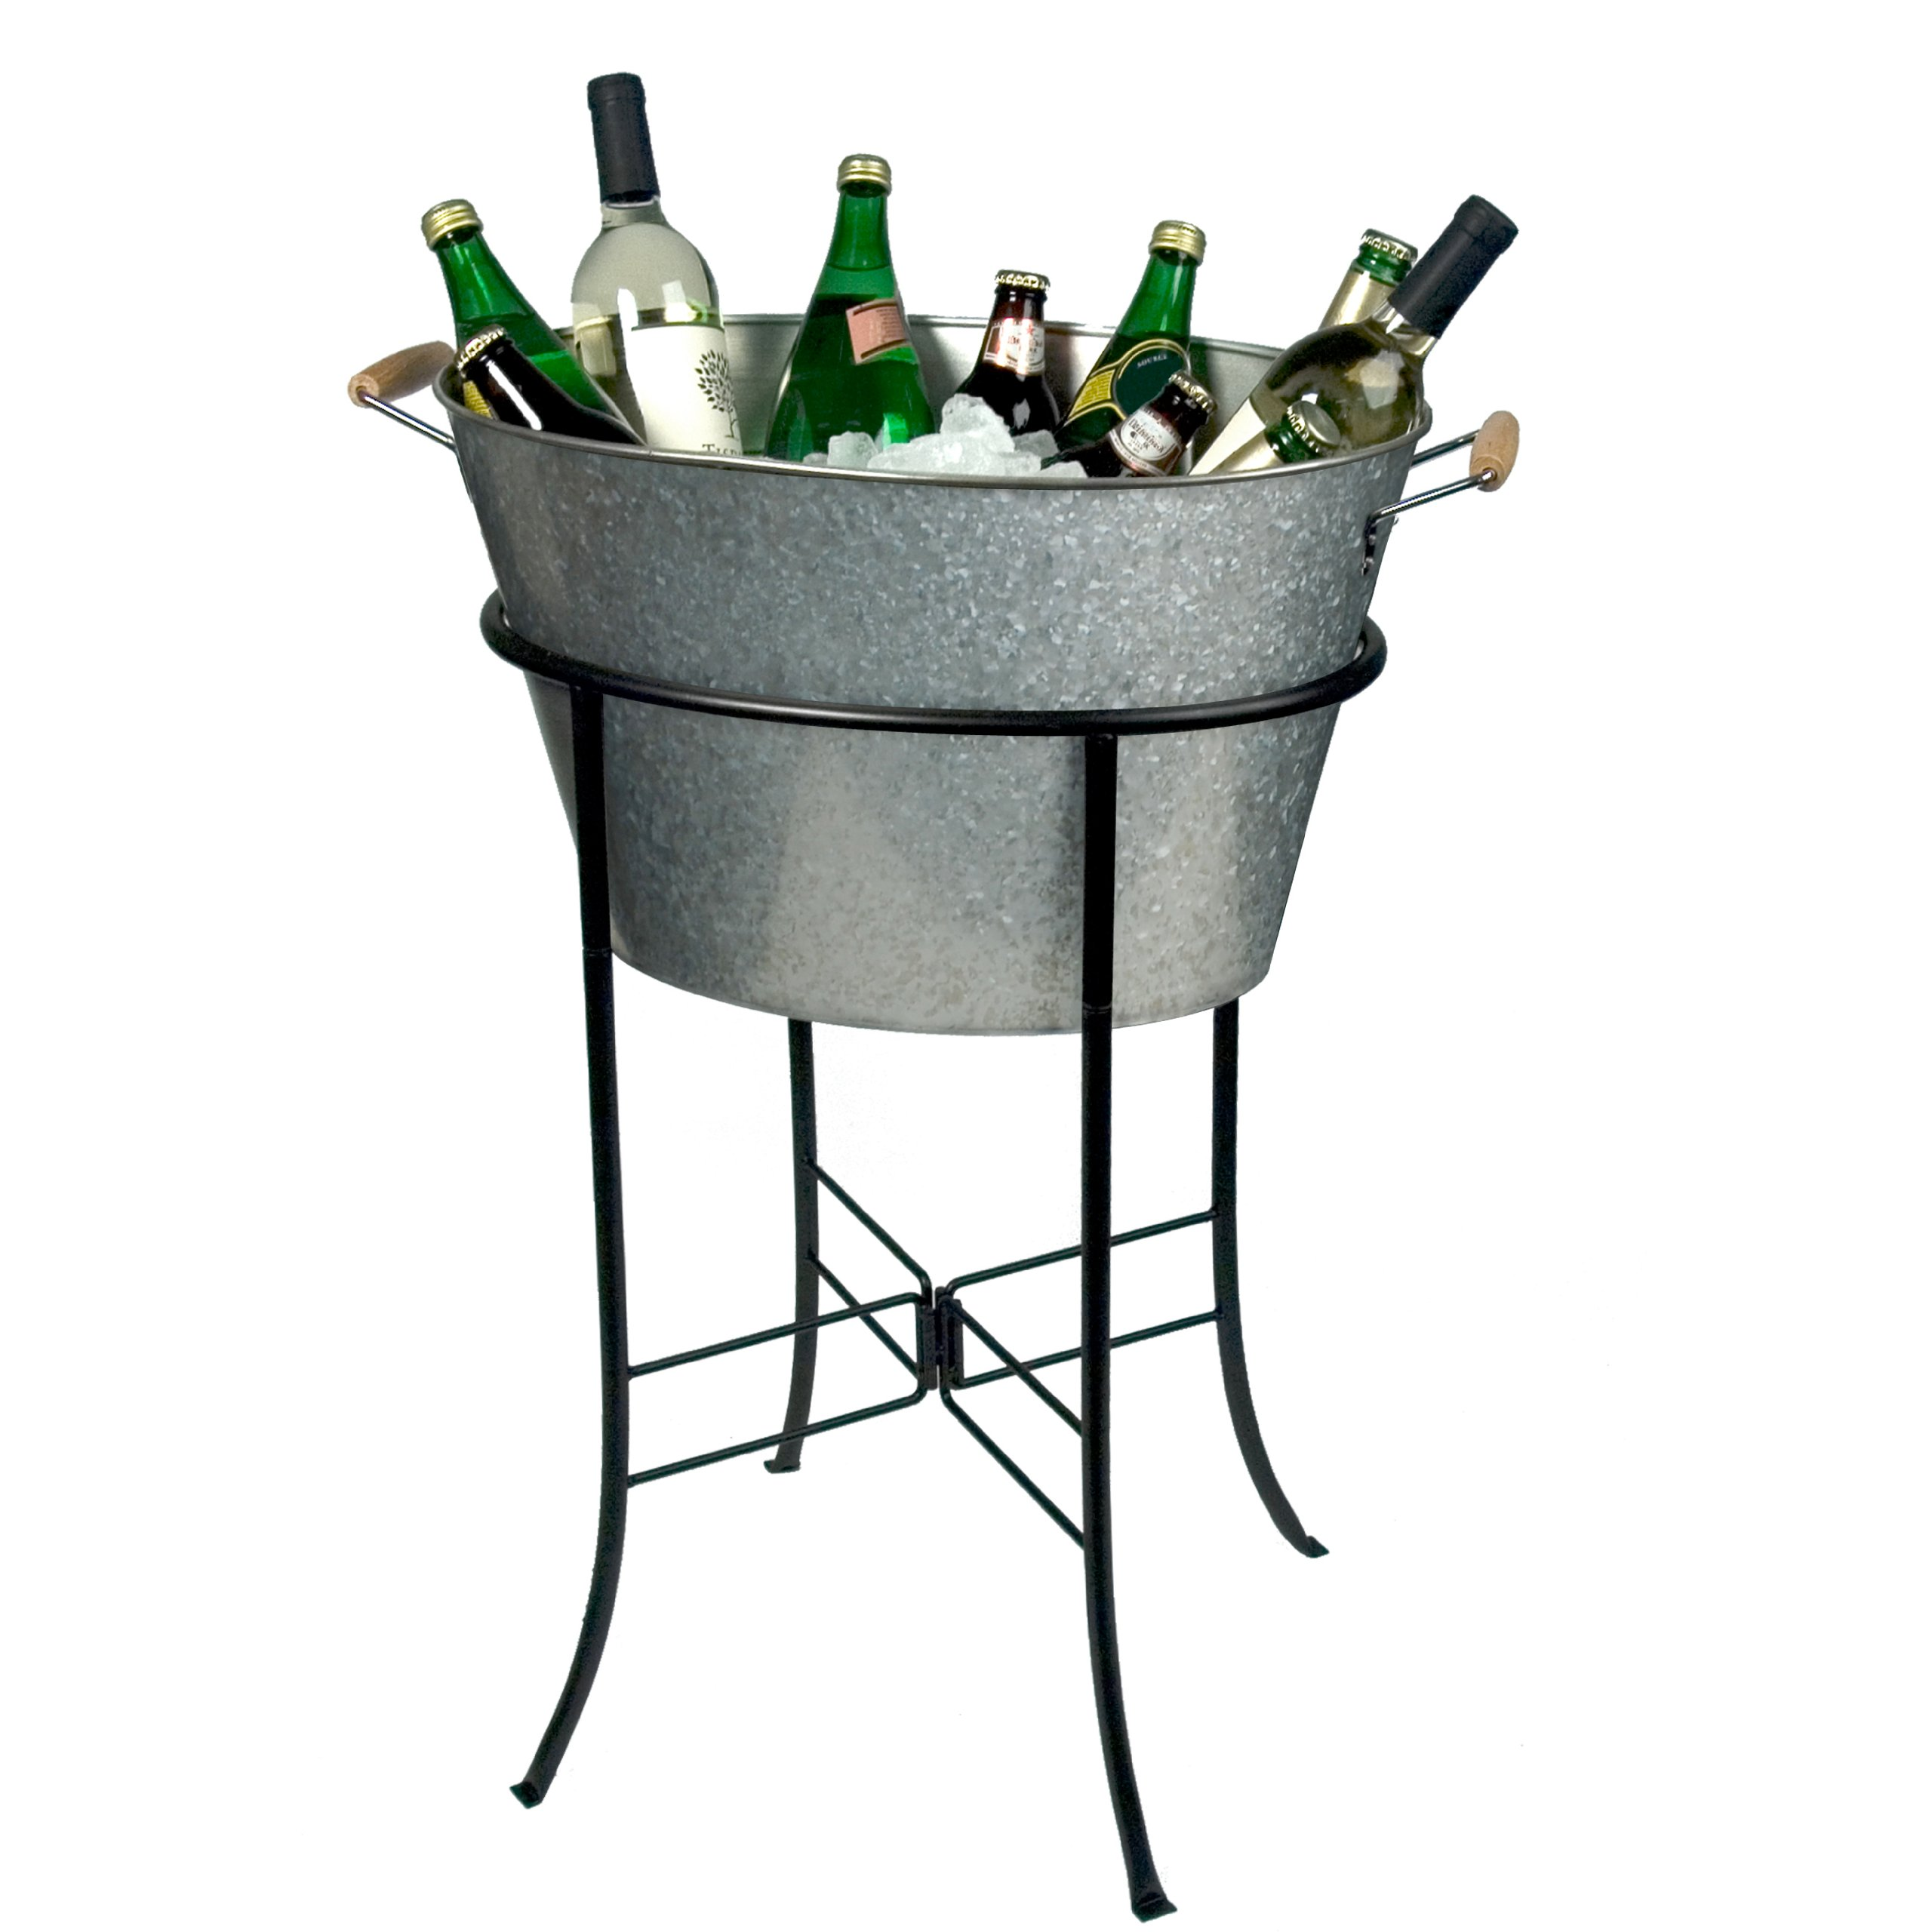 Galvanized Tub Stand Ice Bucket Beverage Cooler Party Wine